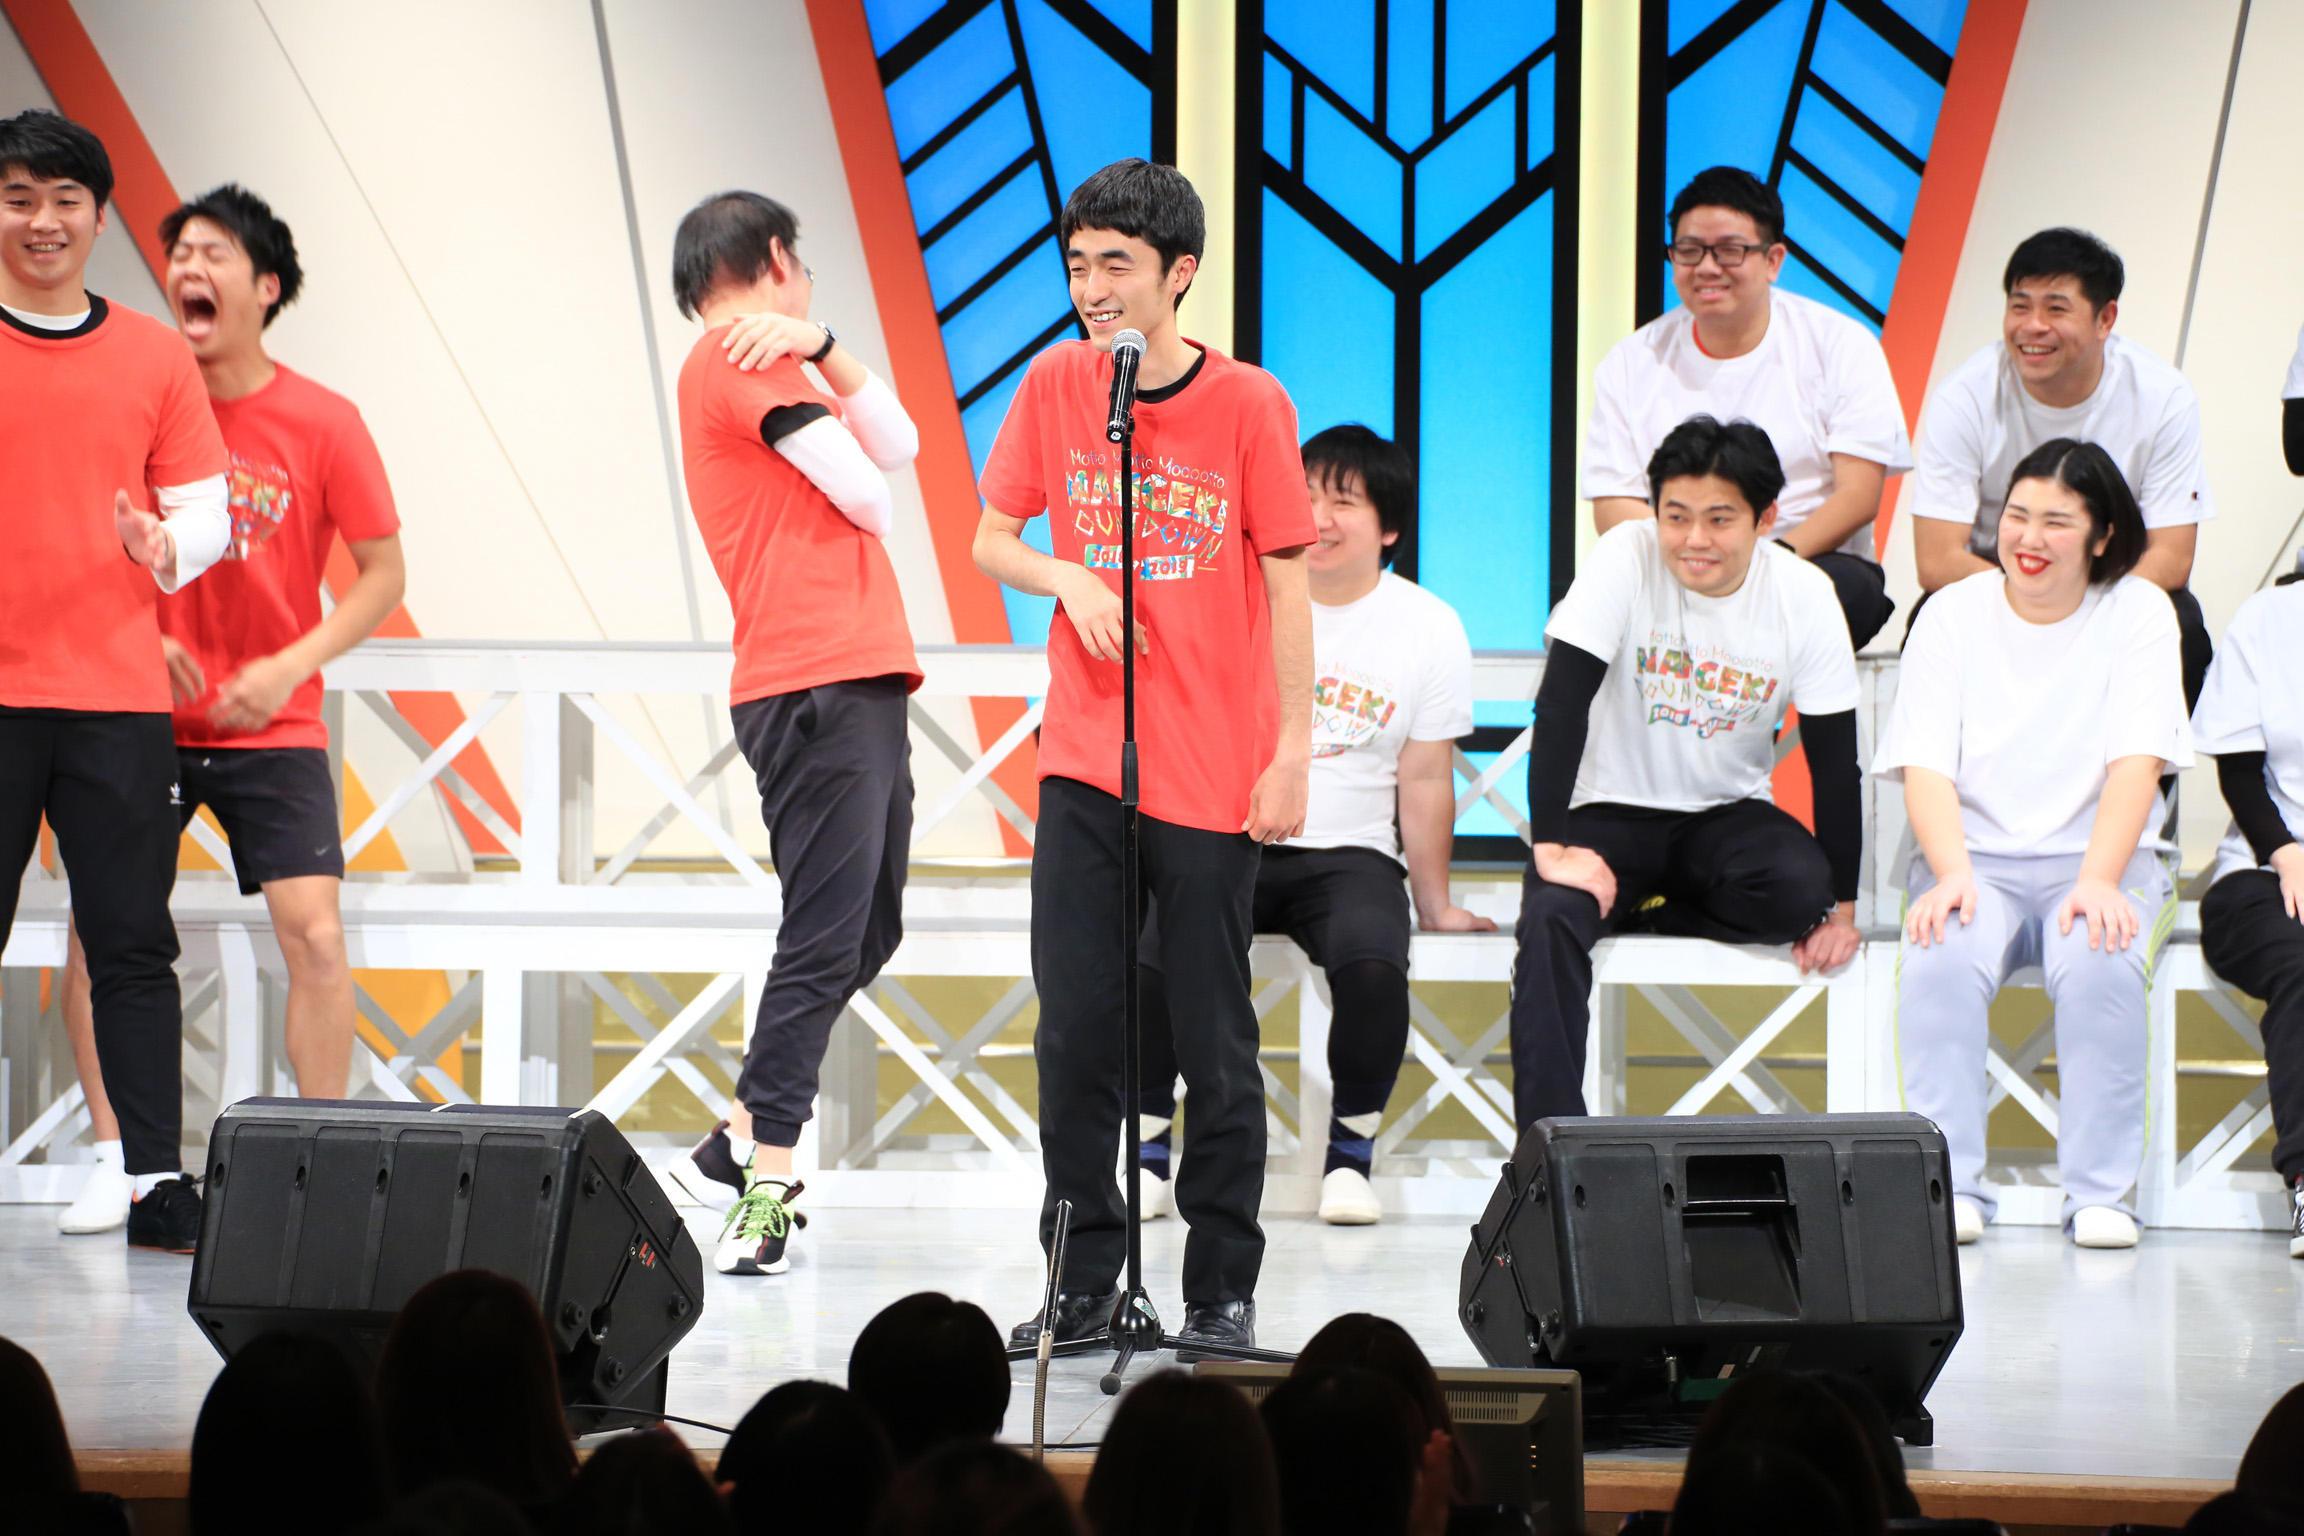 http://news.yoshimoto.co.jp/20190101110227-cb67f1b9881b16849b6b84f667da8bb1d17652e4.jpg